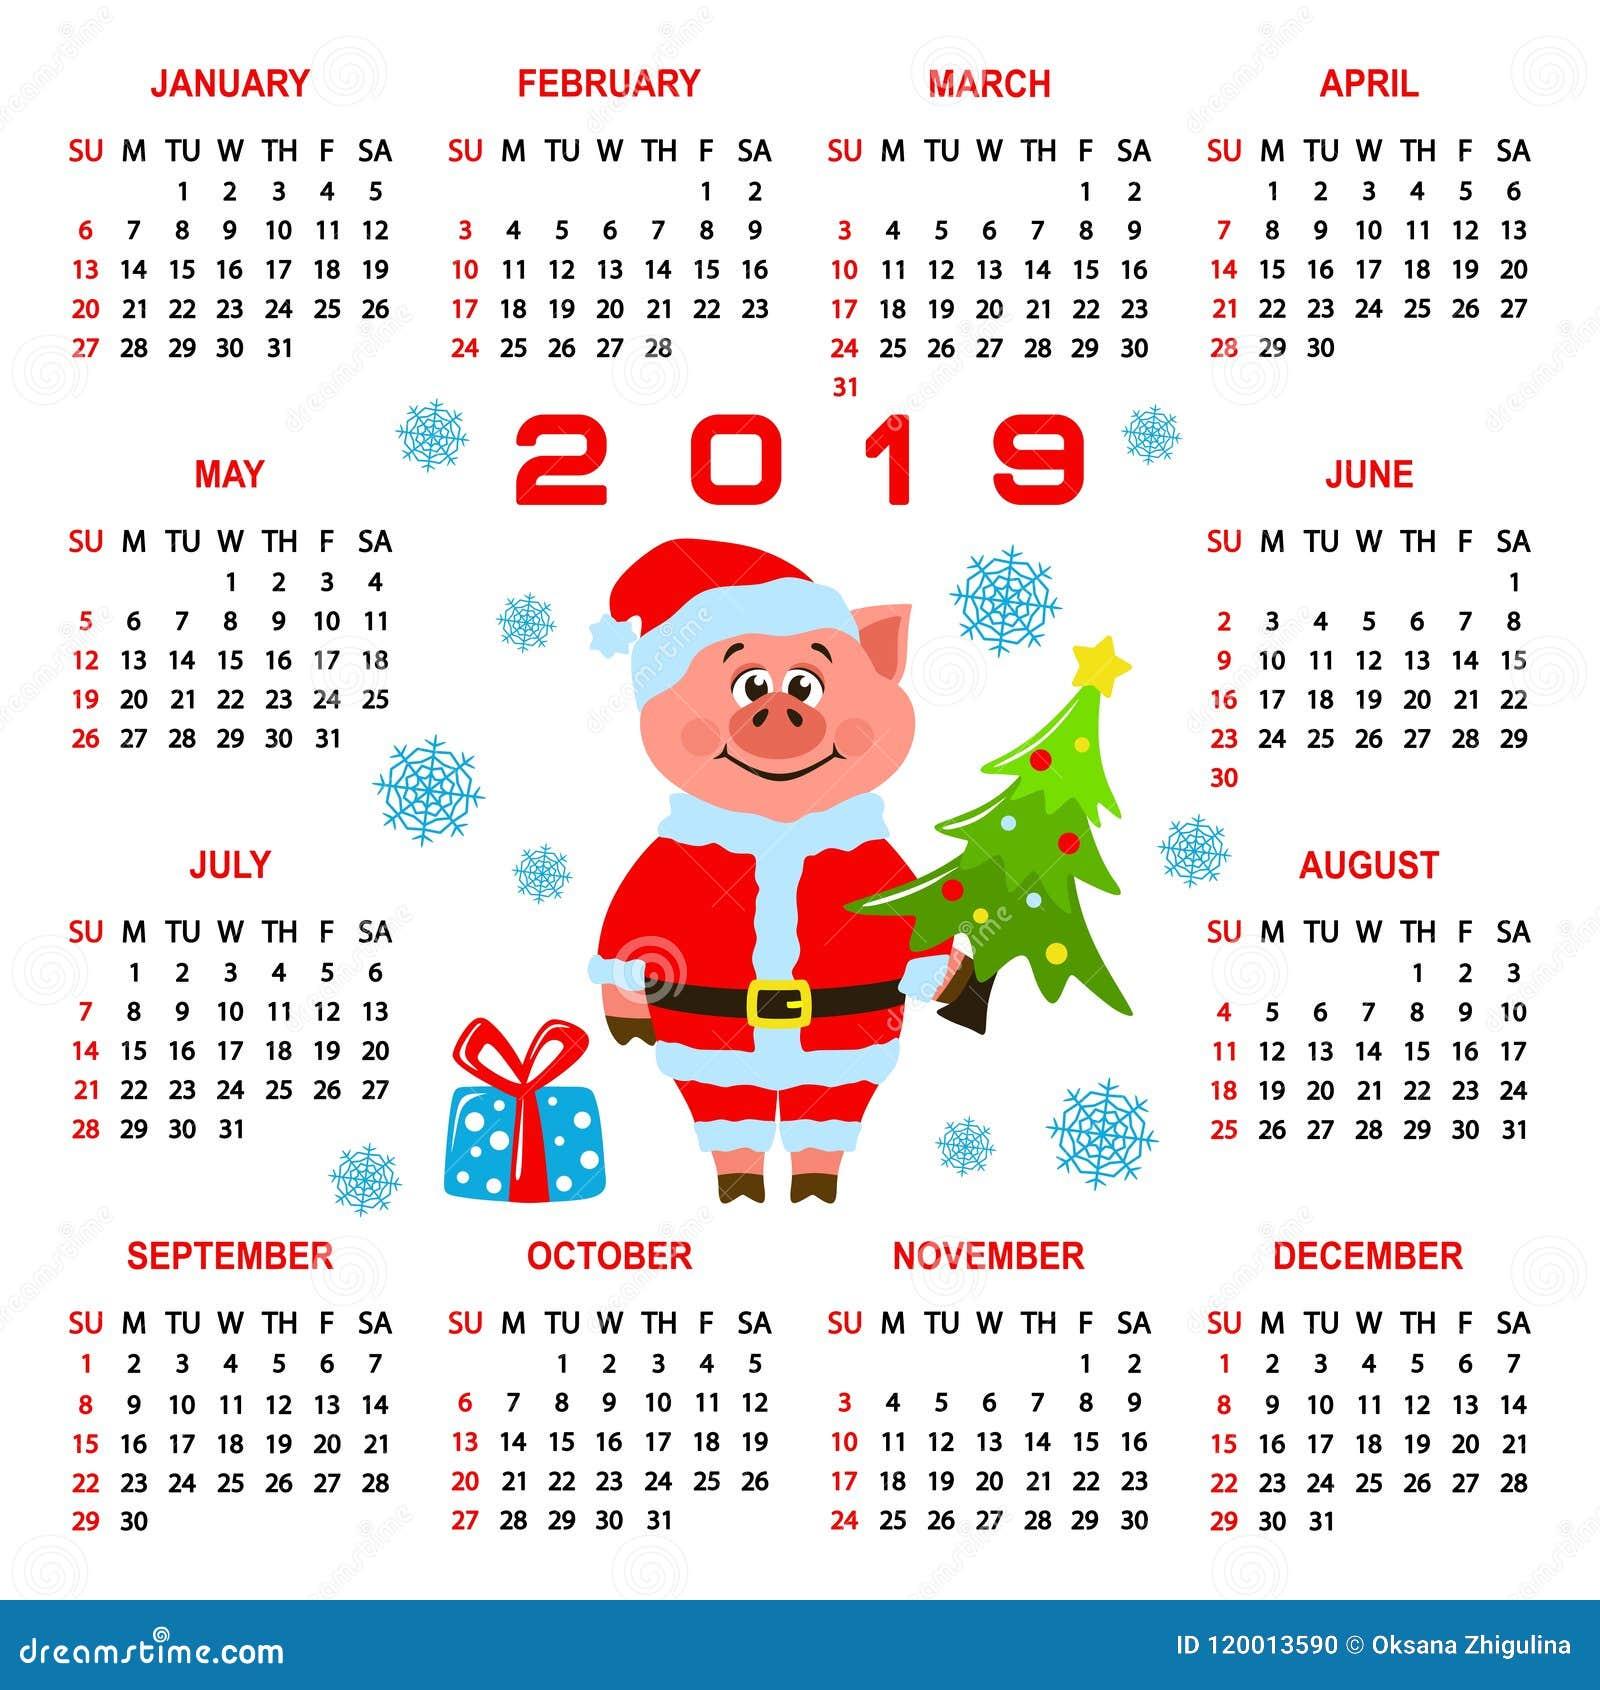 Christmas gifts online chennai fm